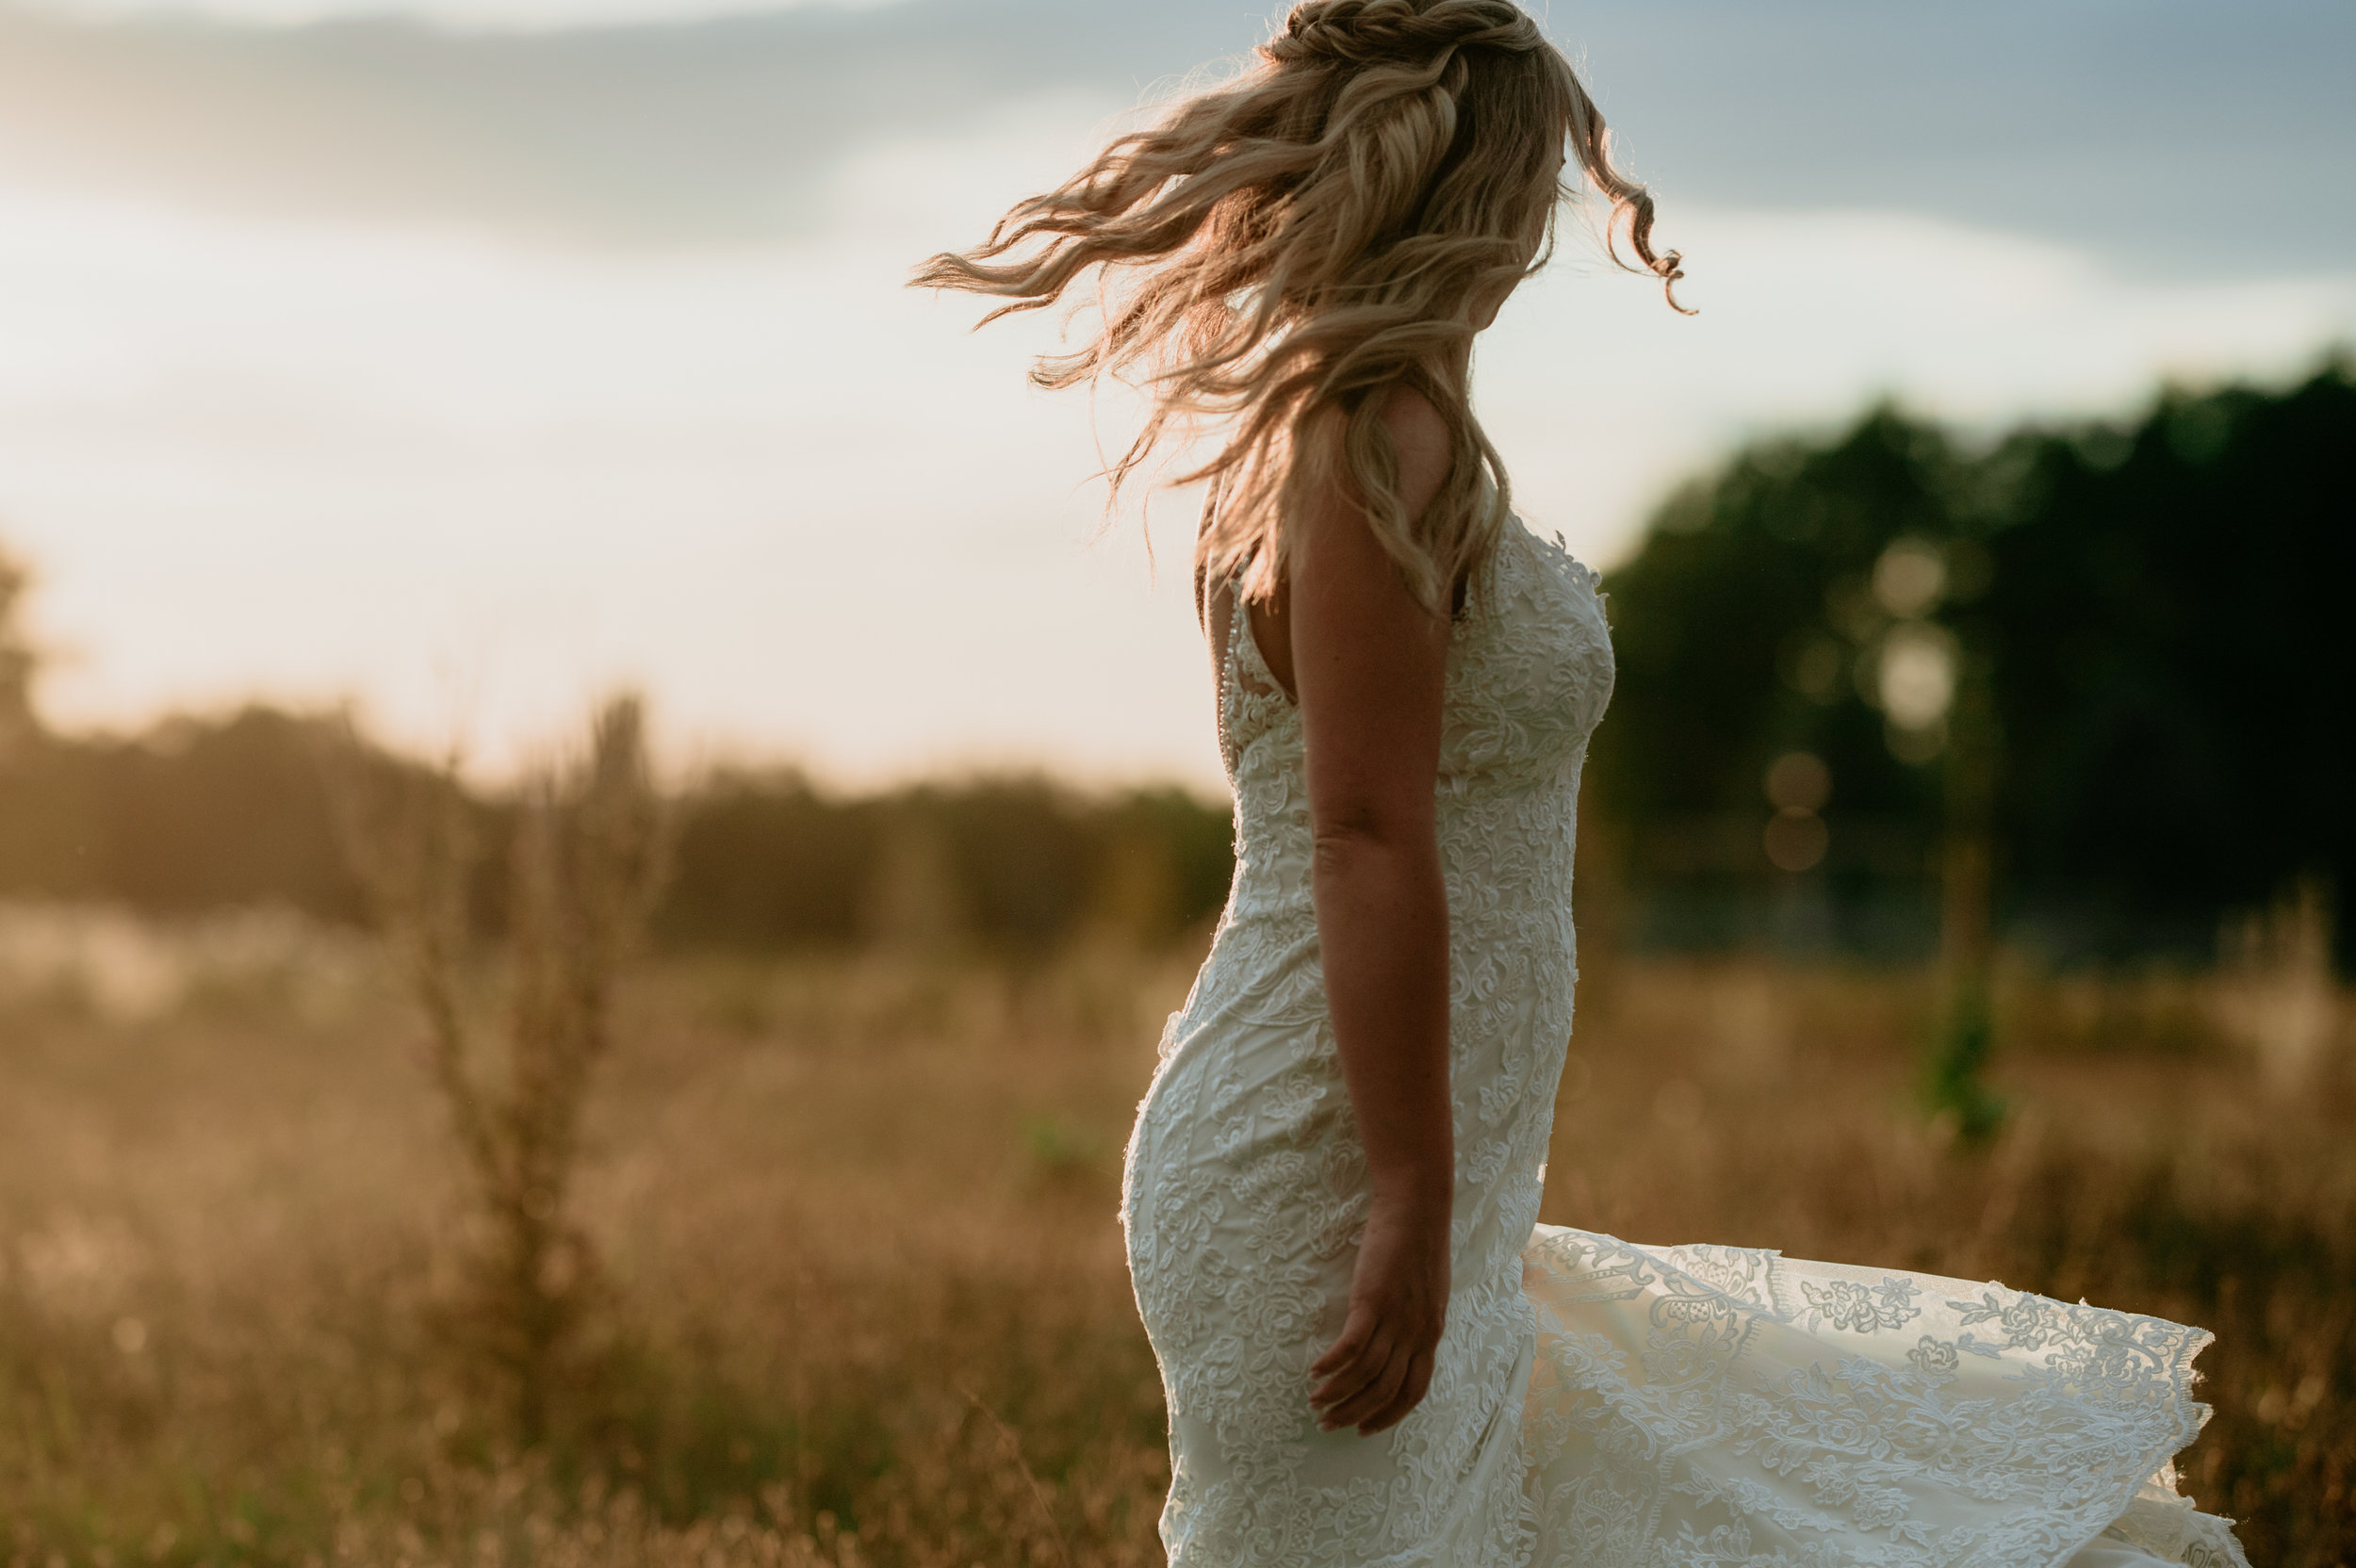 055Sky Ridge Ranch Wedding_Montana Wedding Photographer_Jessica & Brian_Honeybee Weddings_August 24, 2019-33.jpg